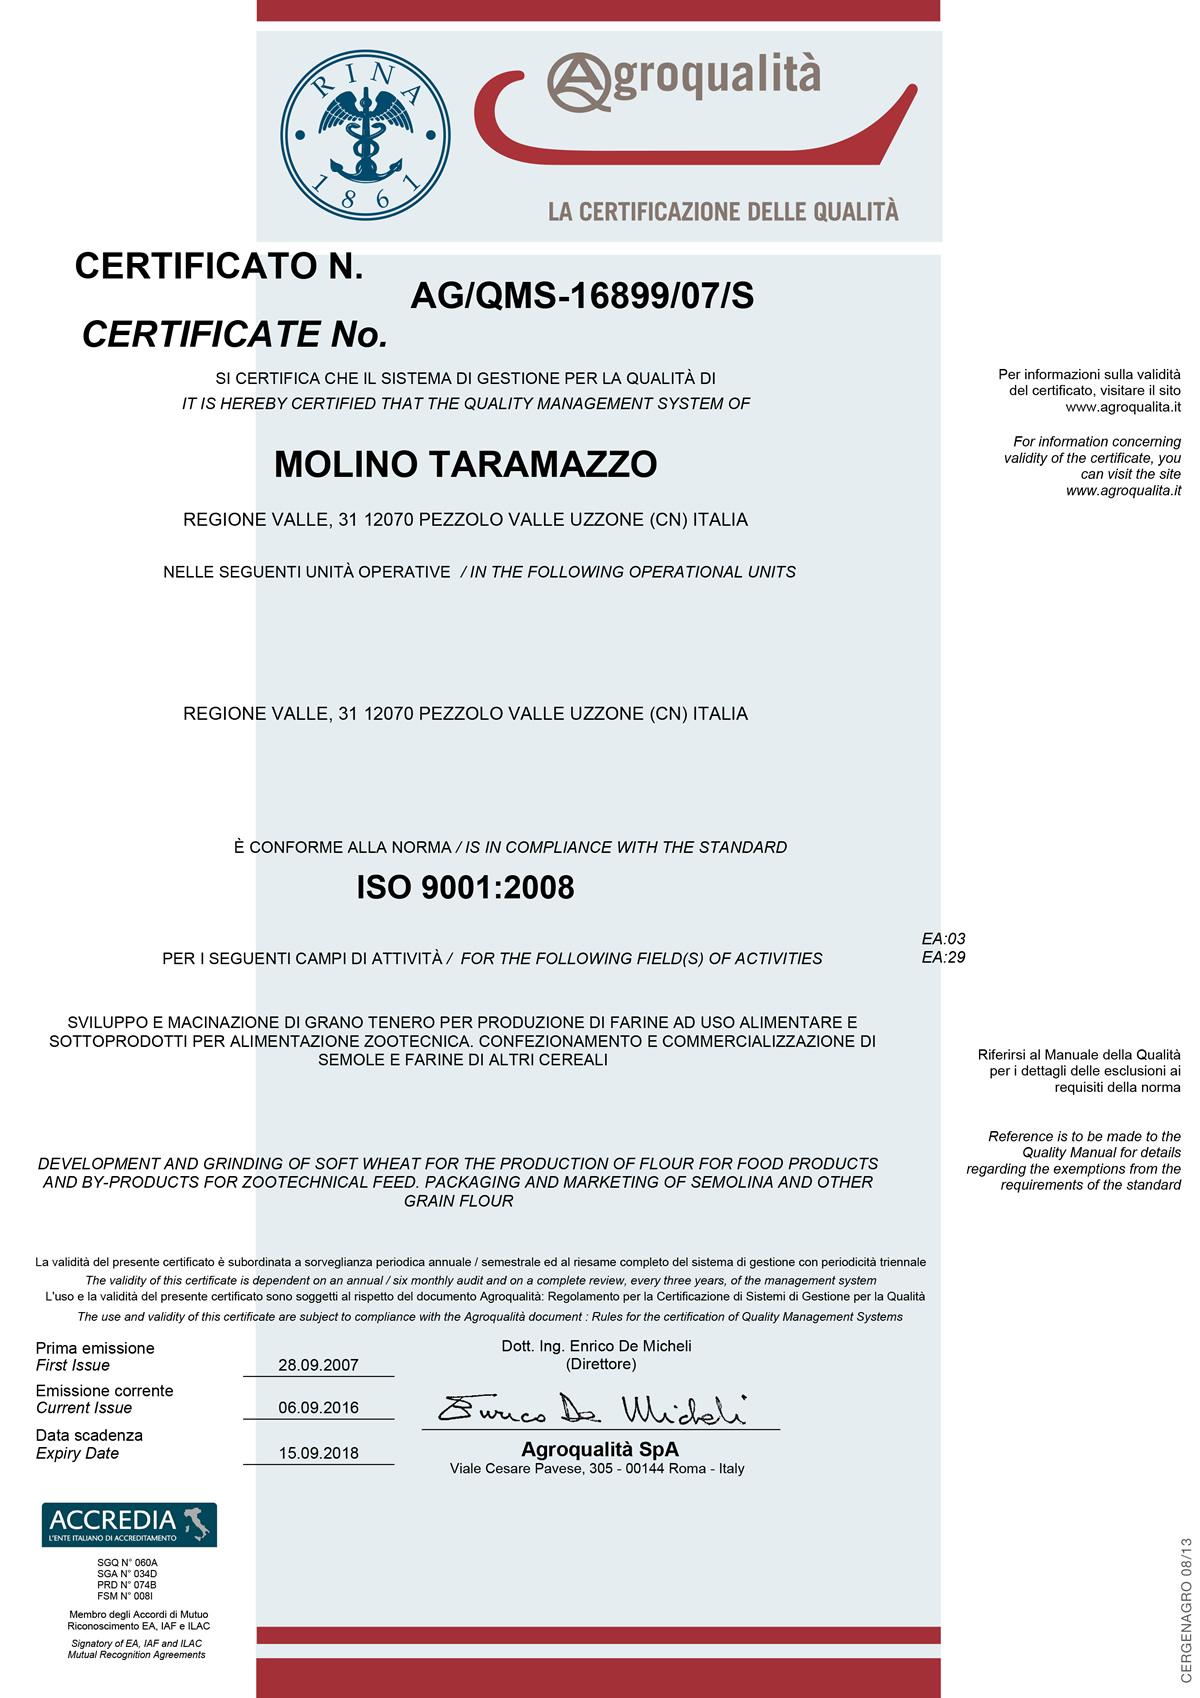 Certificato ISO 9001:2008 Molino Taramazzo.